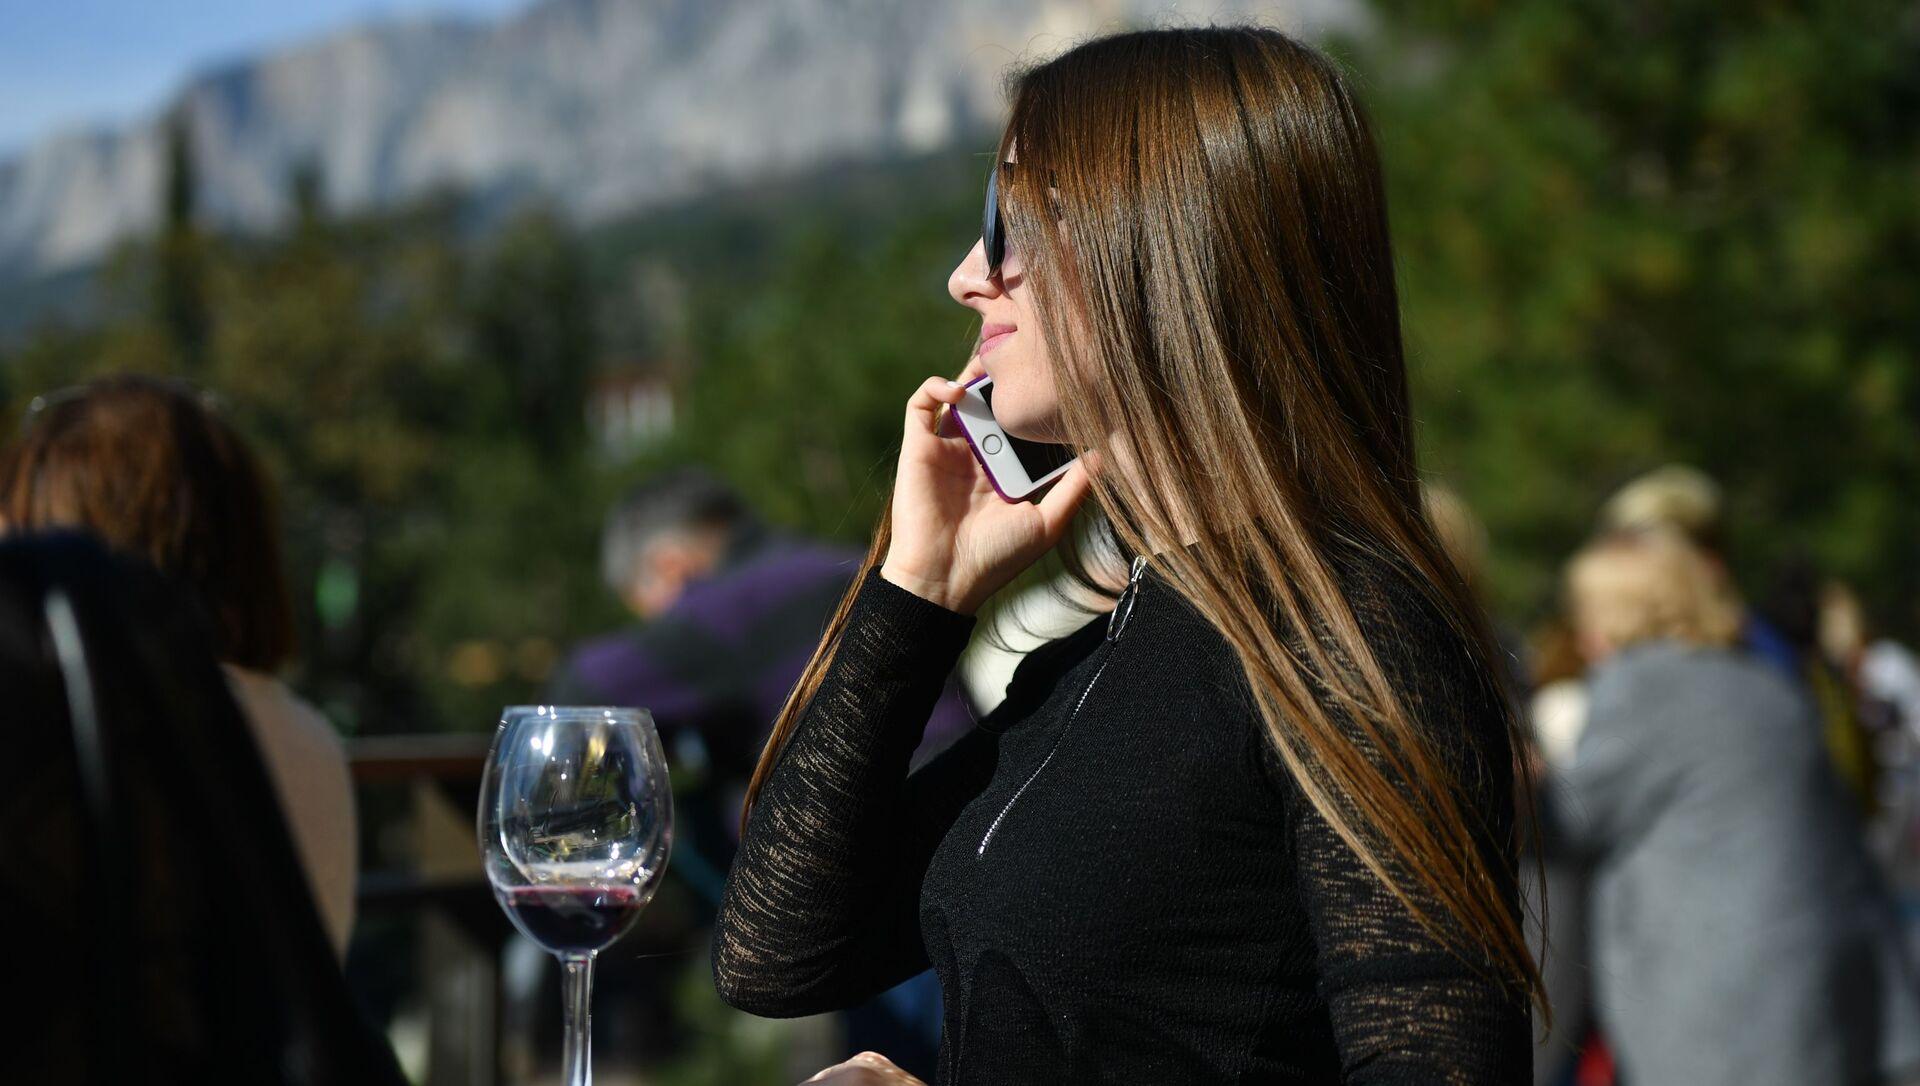 Una ragazza parla al telefono - Sputnik Italia, 1920, 03.02.2021